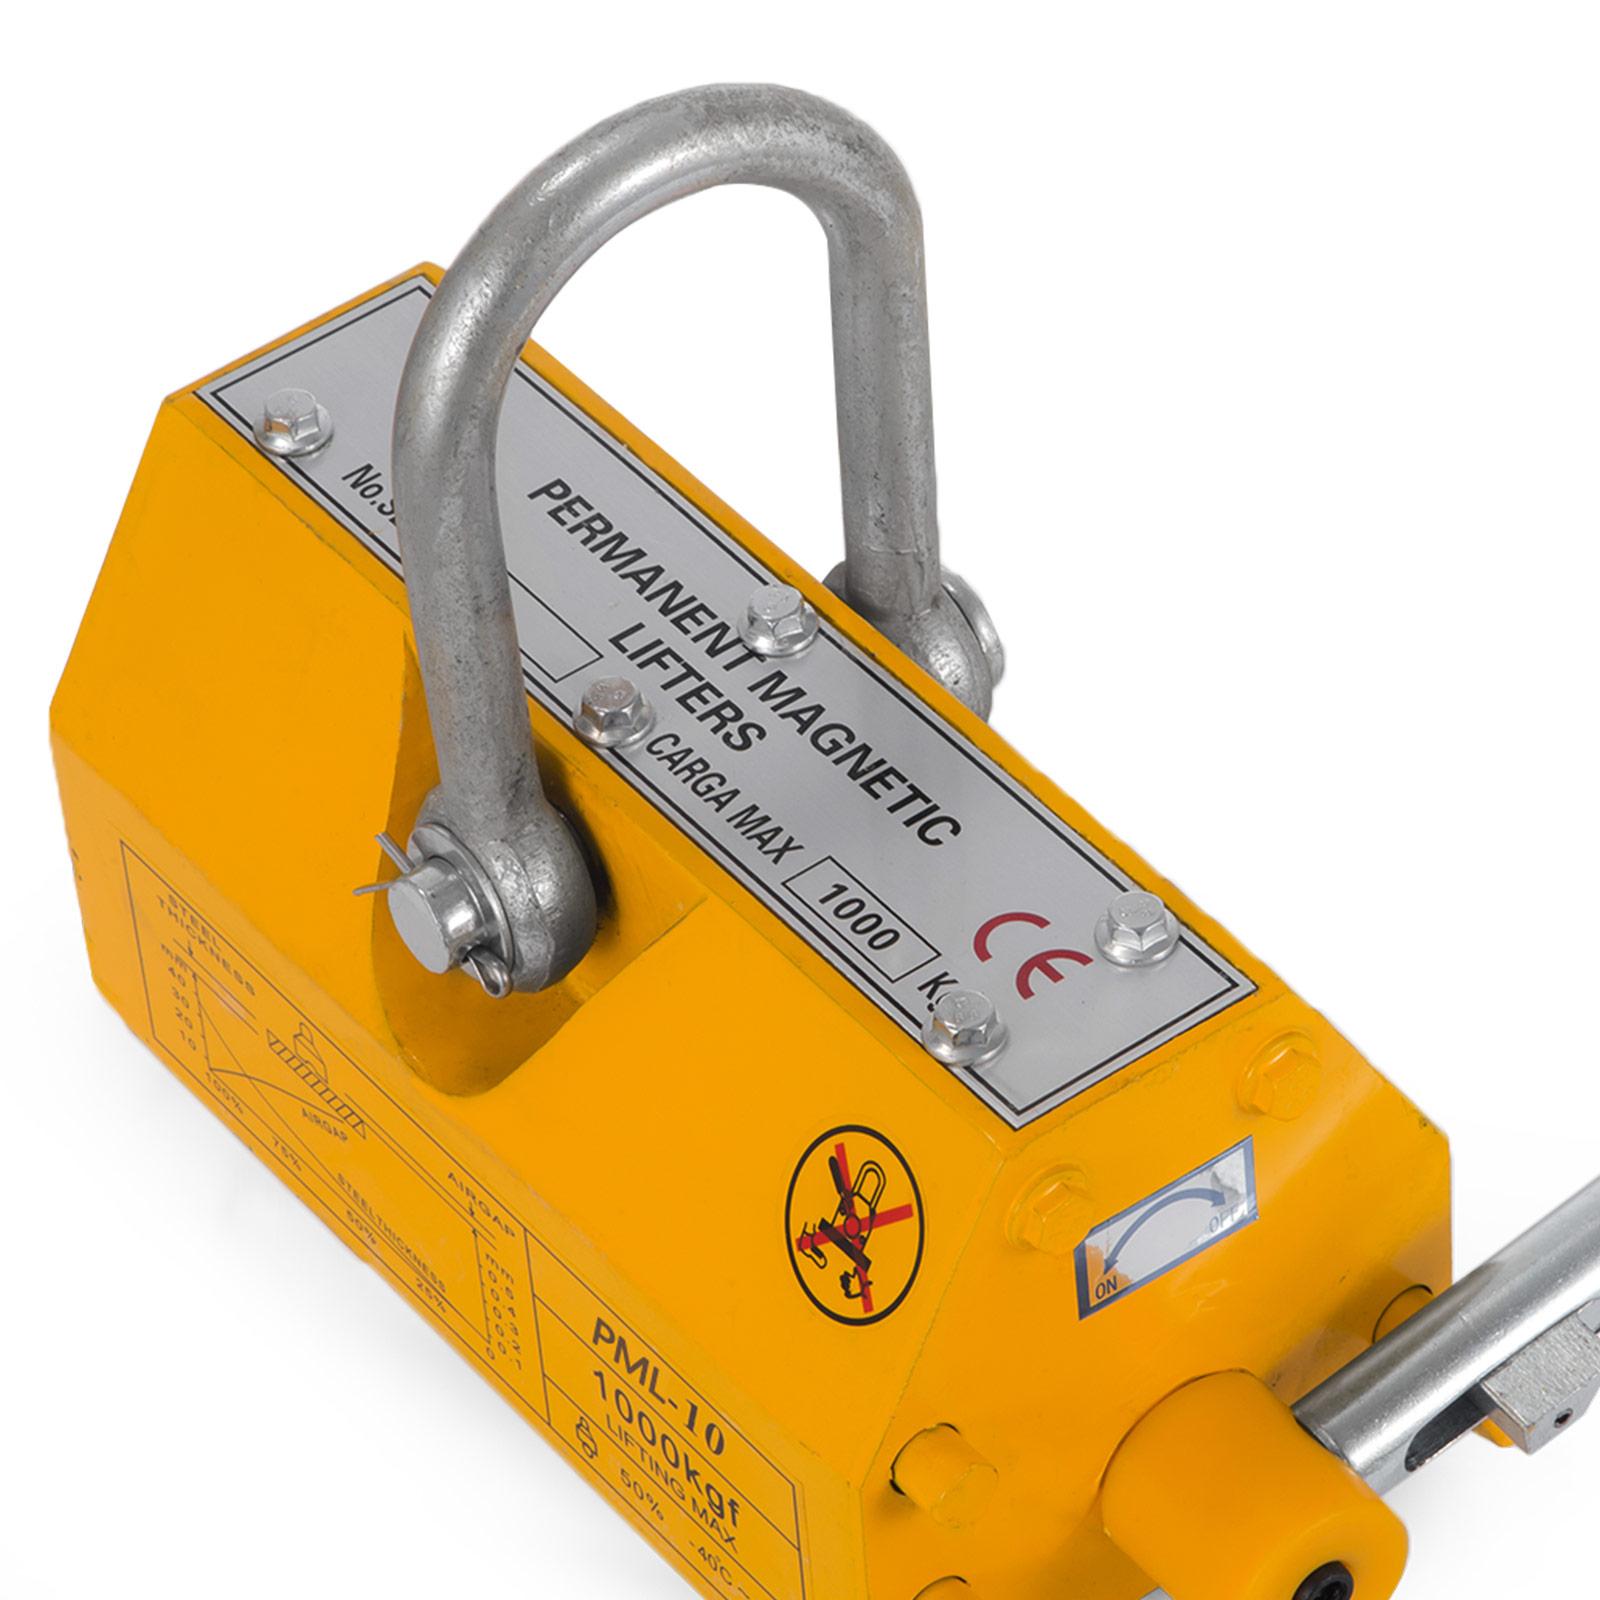 100-300-600-1000KG-Steel-Magnetic-Lifter-Heavy-Duty-Crane-Hoist-Lifting-Magnet miniature 67